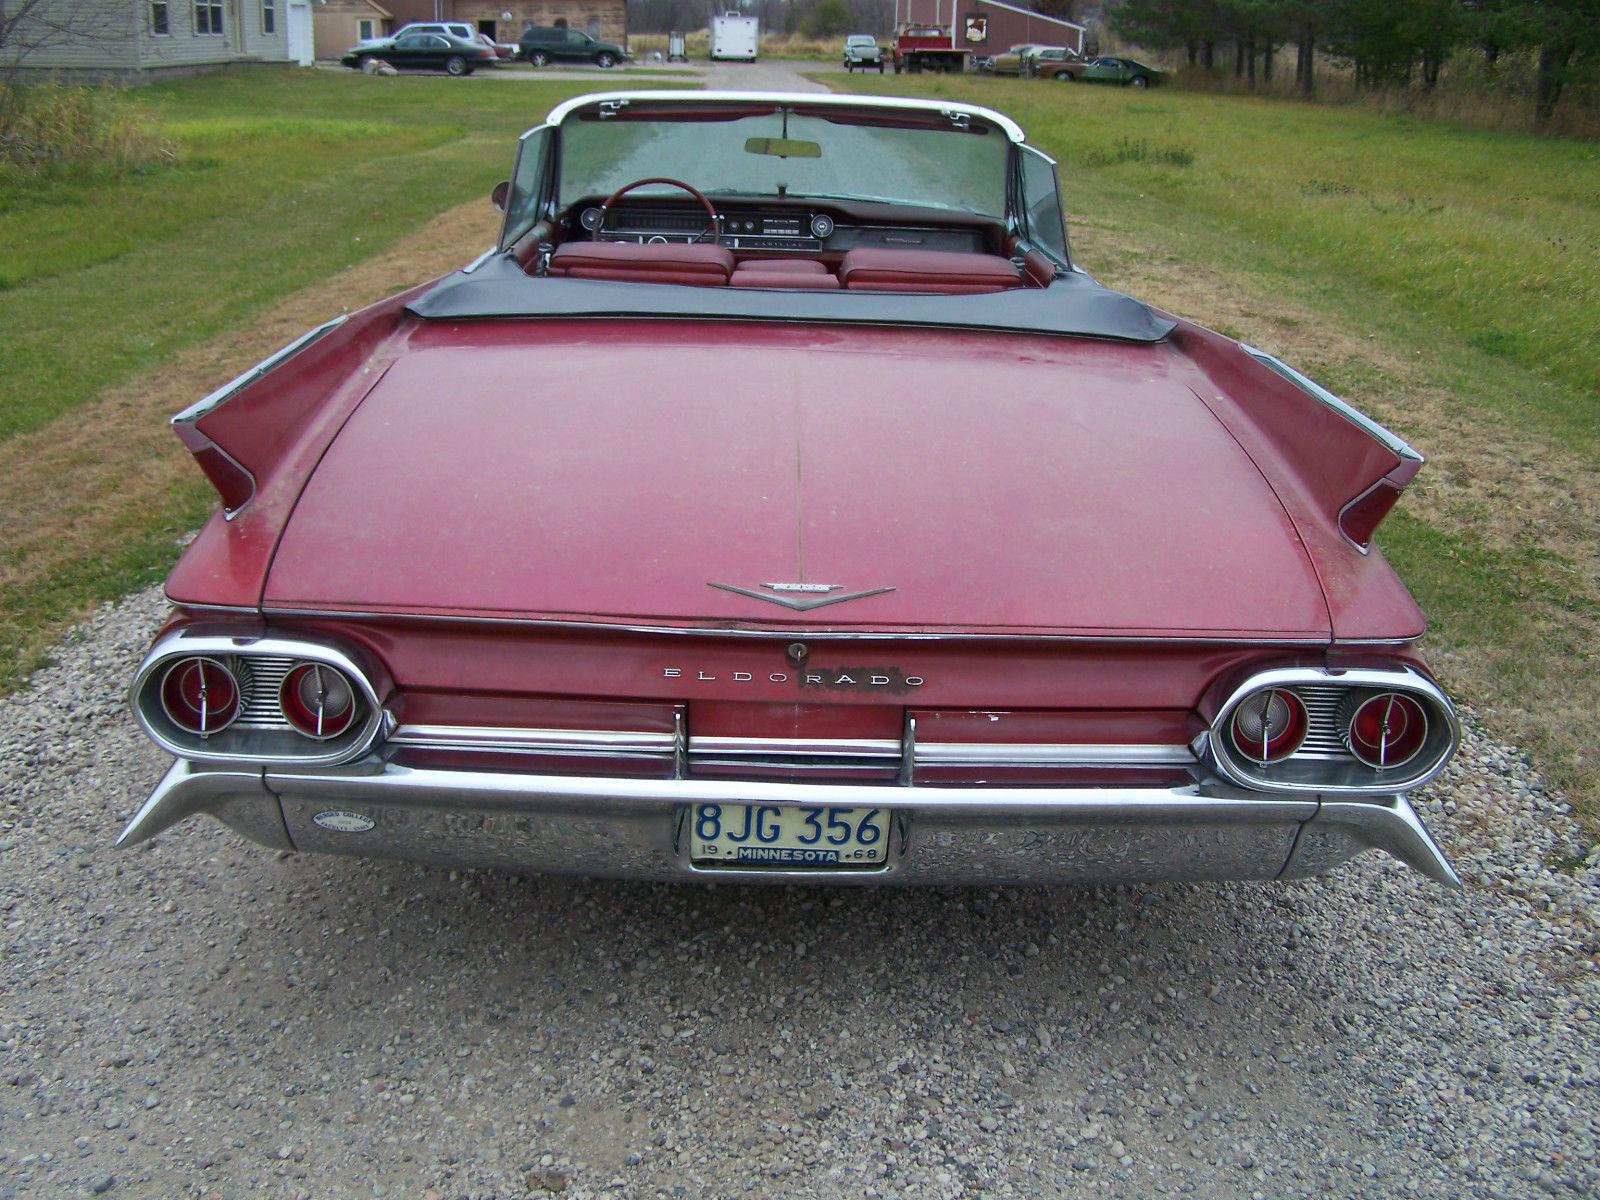 1961 Cadillac Eldorado Convertible In Storage For Over 25 Years Fleetwood Engine